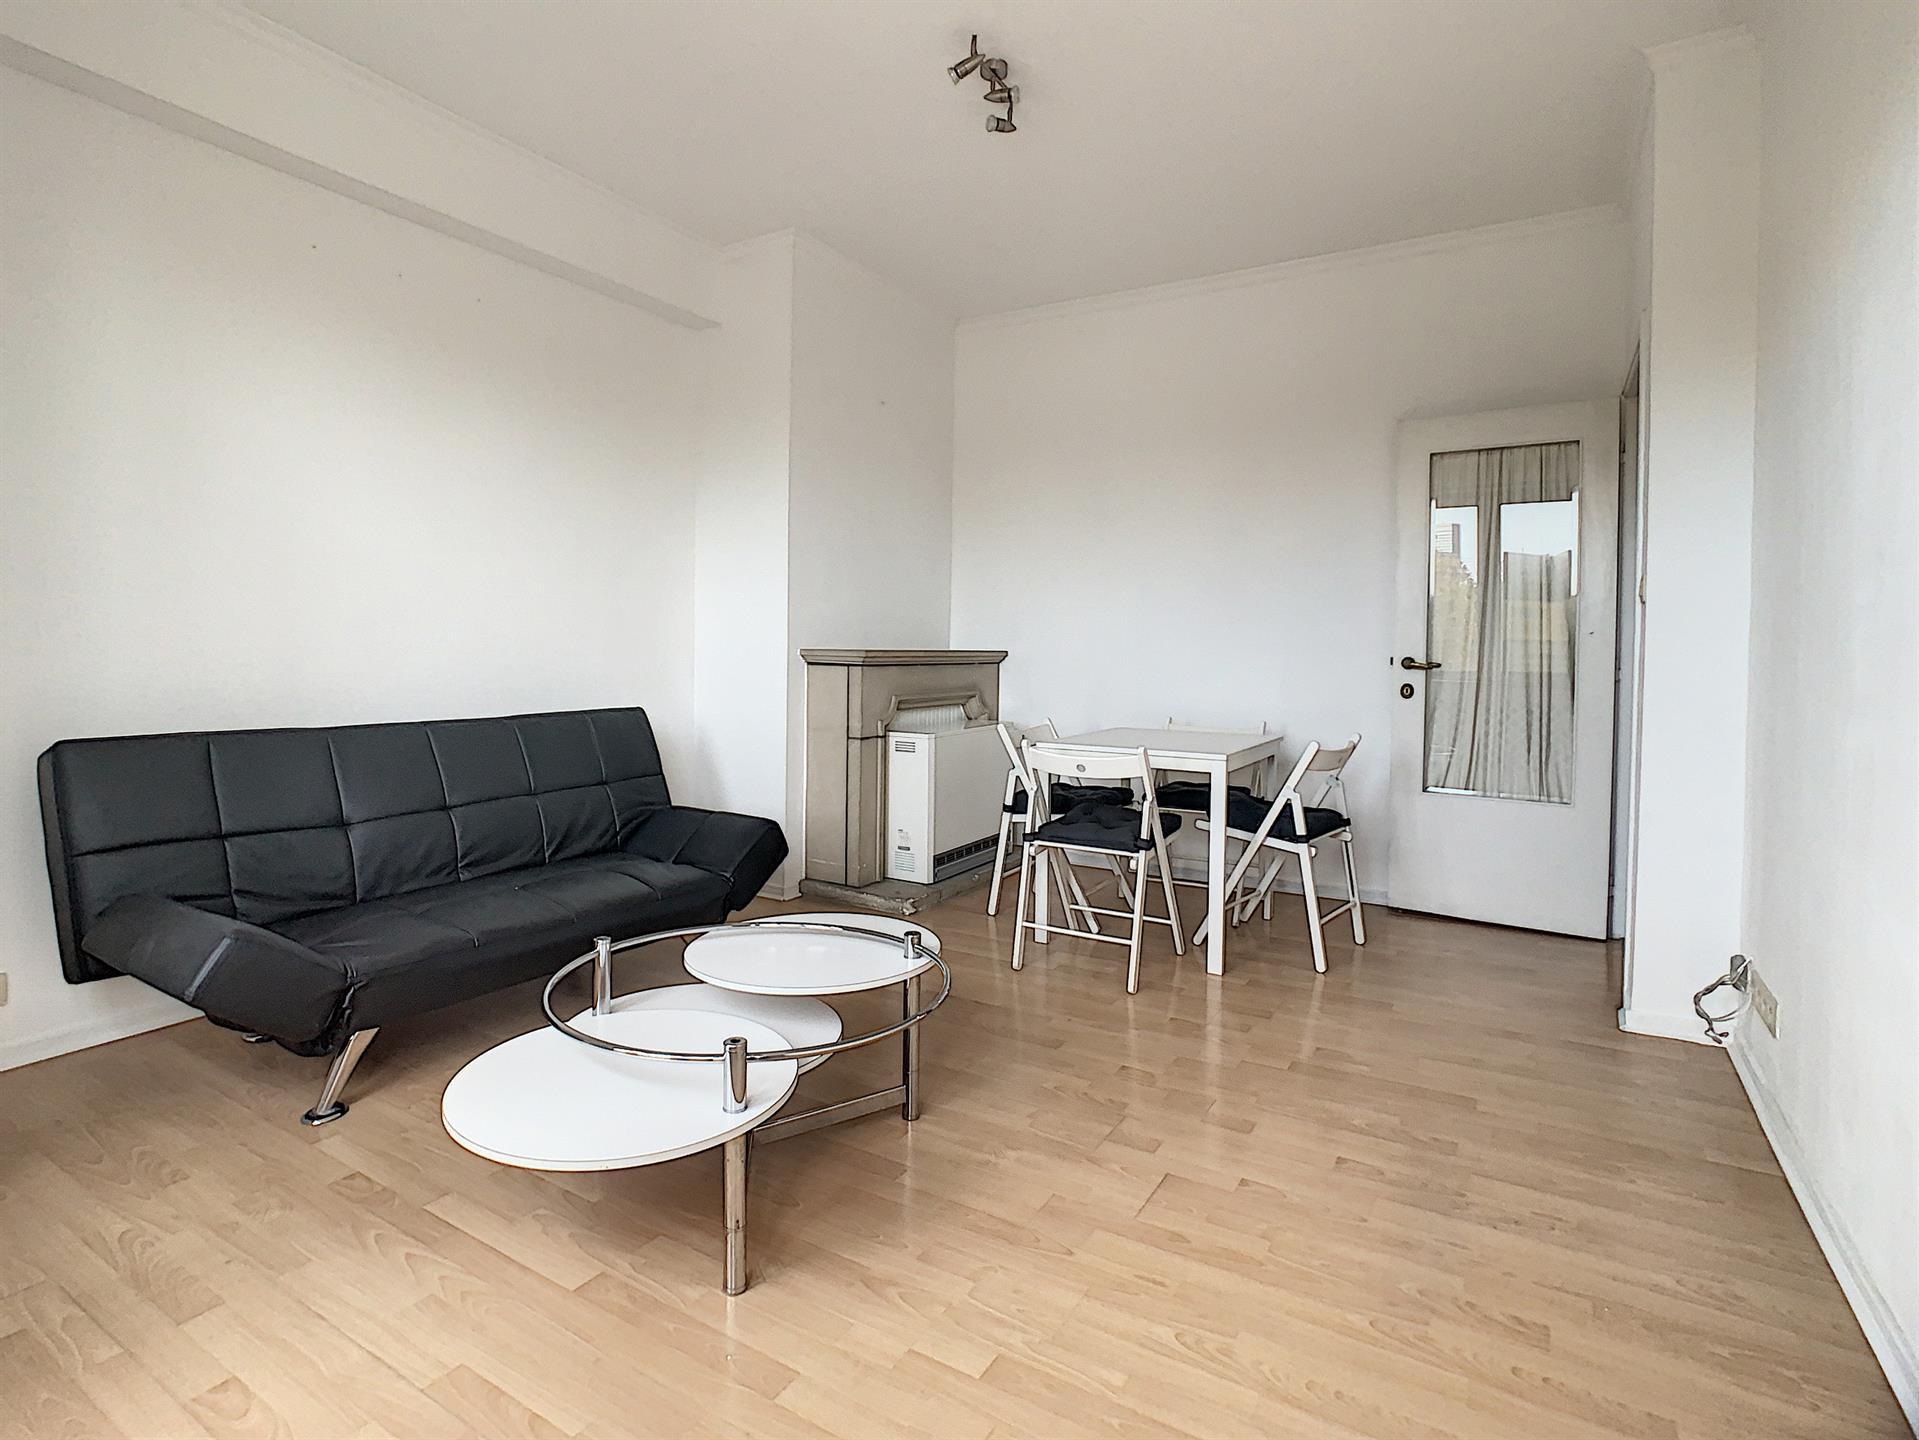 Appartement - Sint-Gillis - #4202152-0